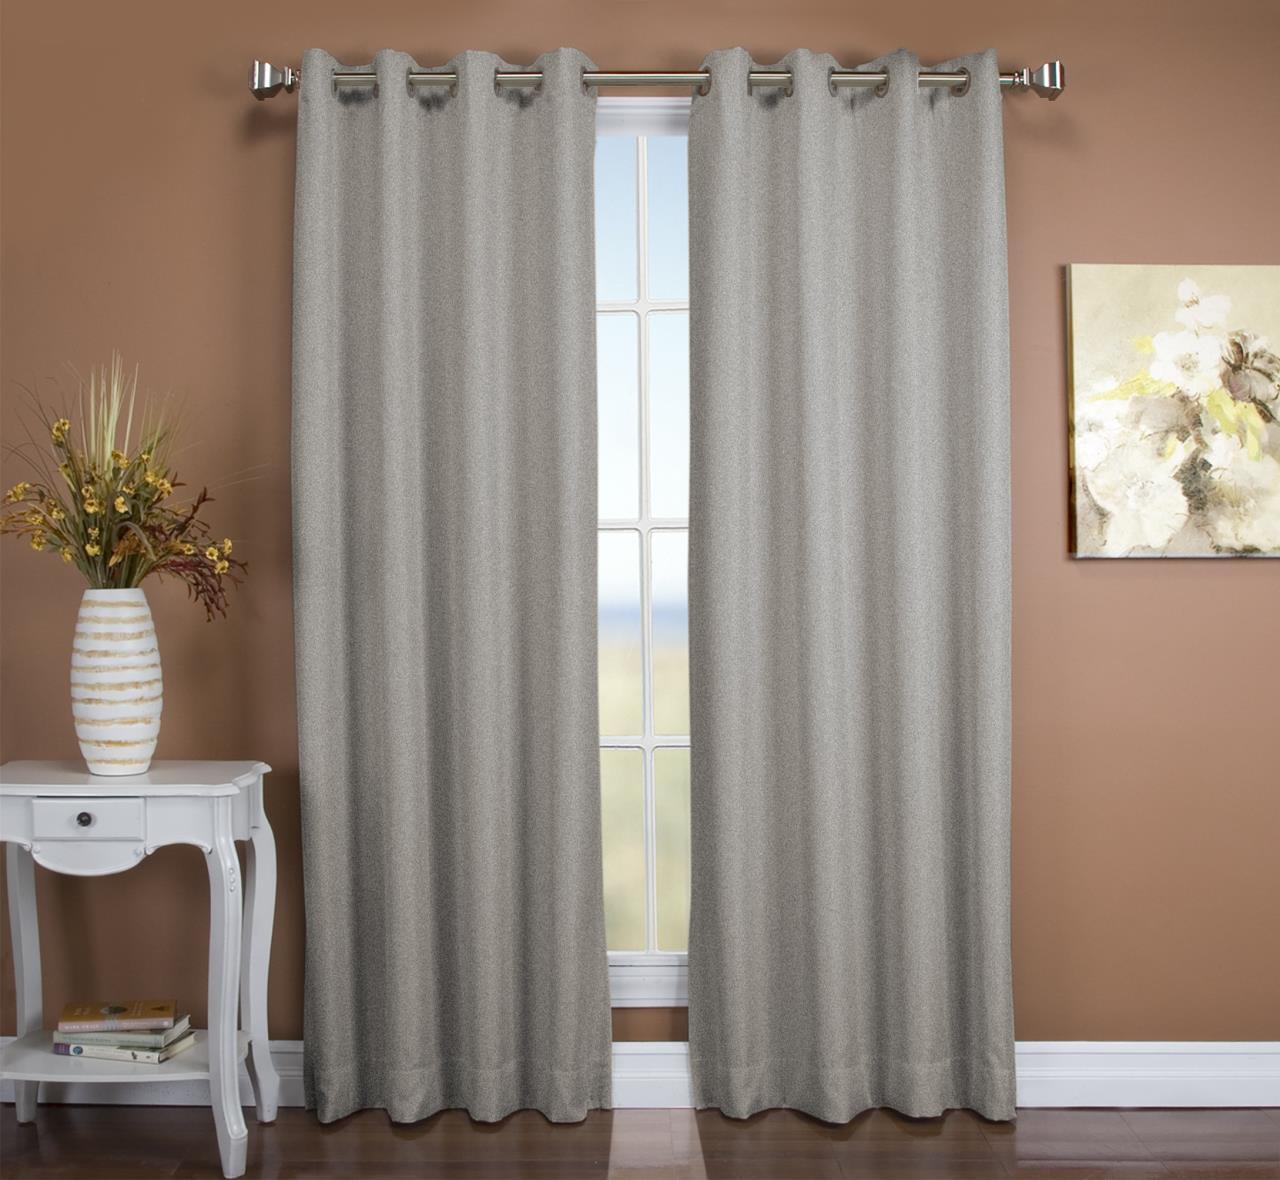 Tacoma Double Blackout Curtains -